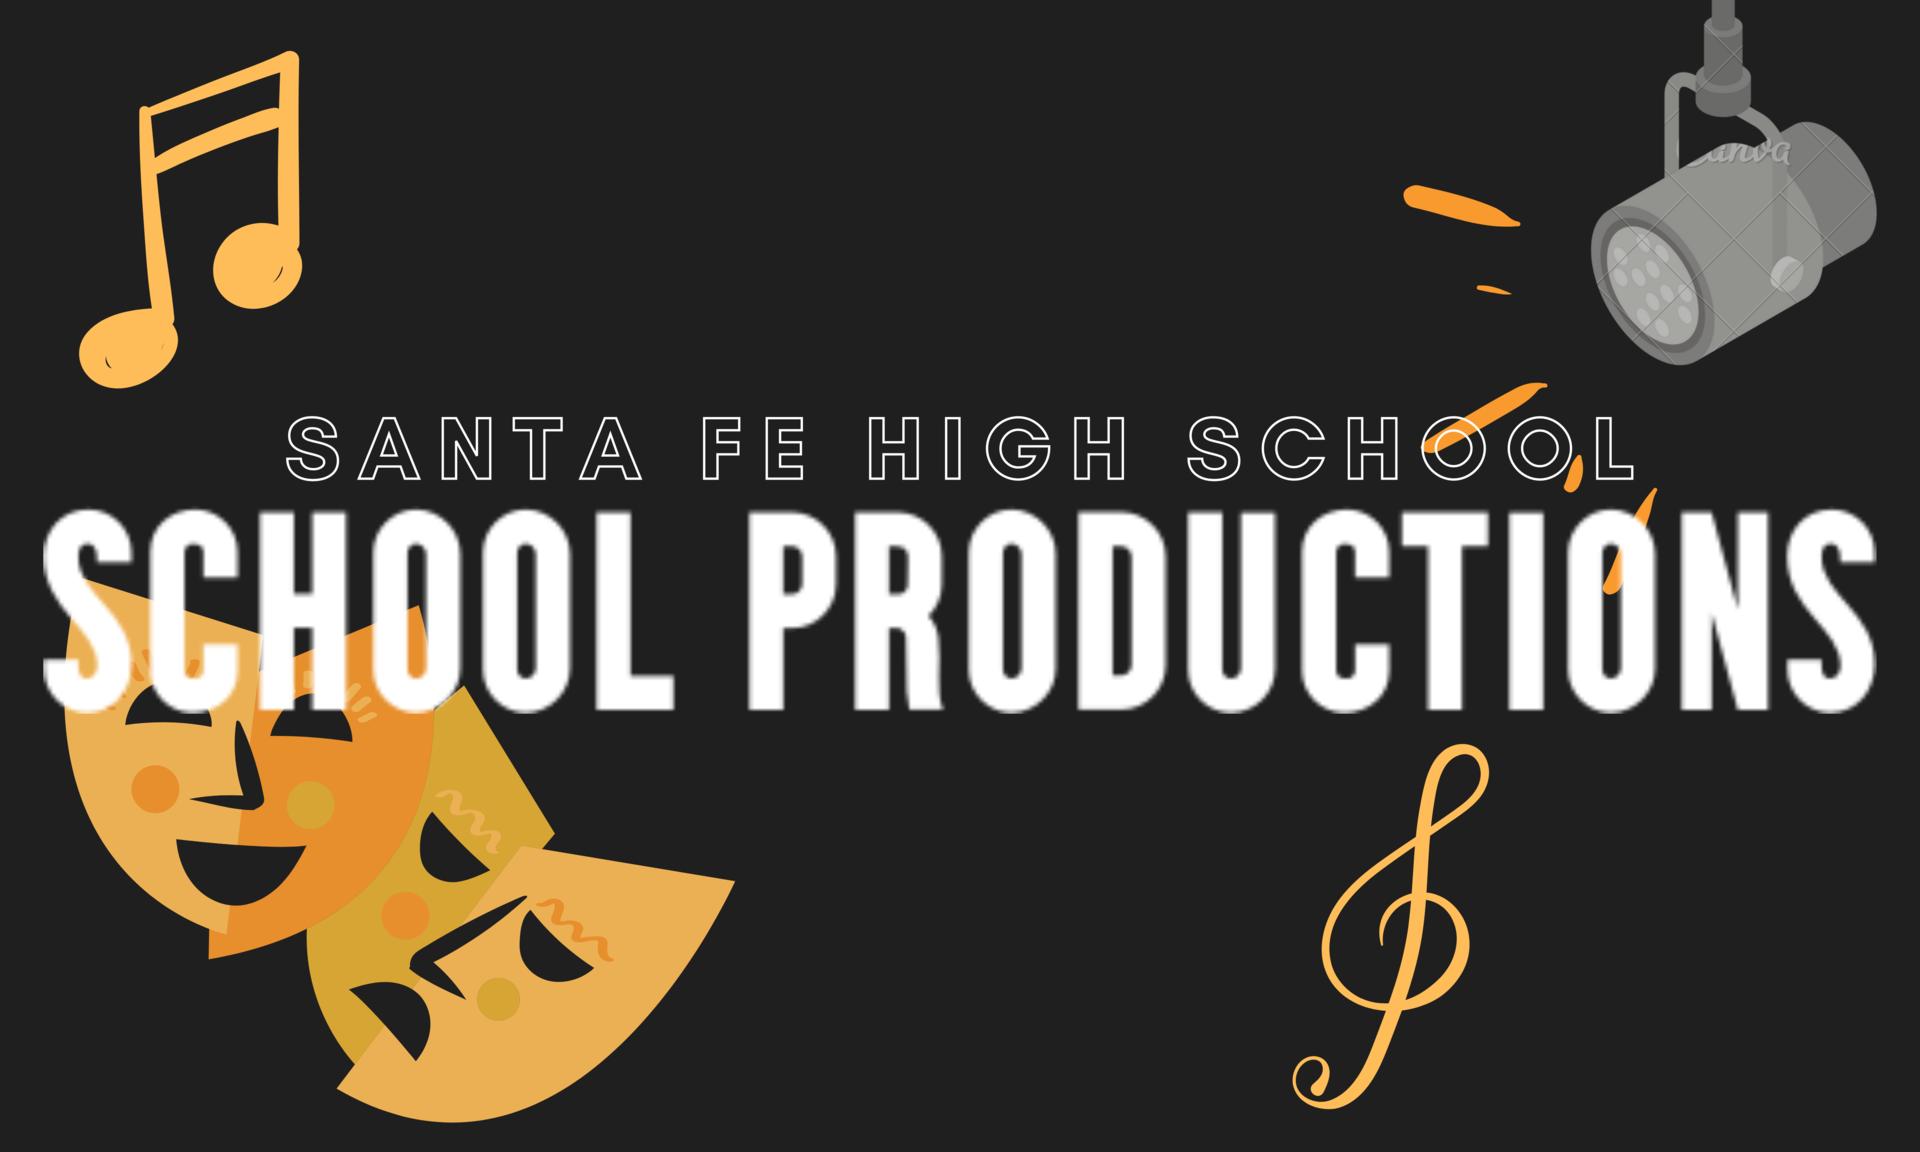 School Productions